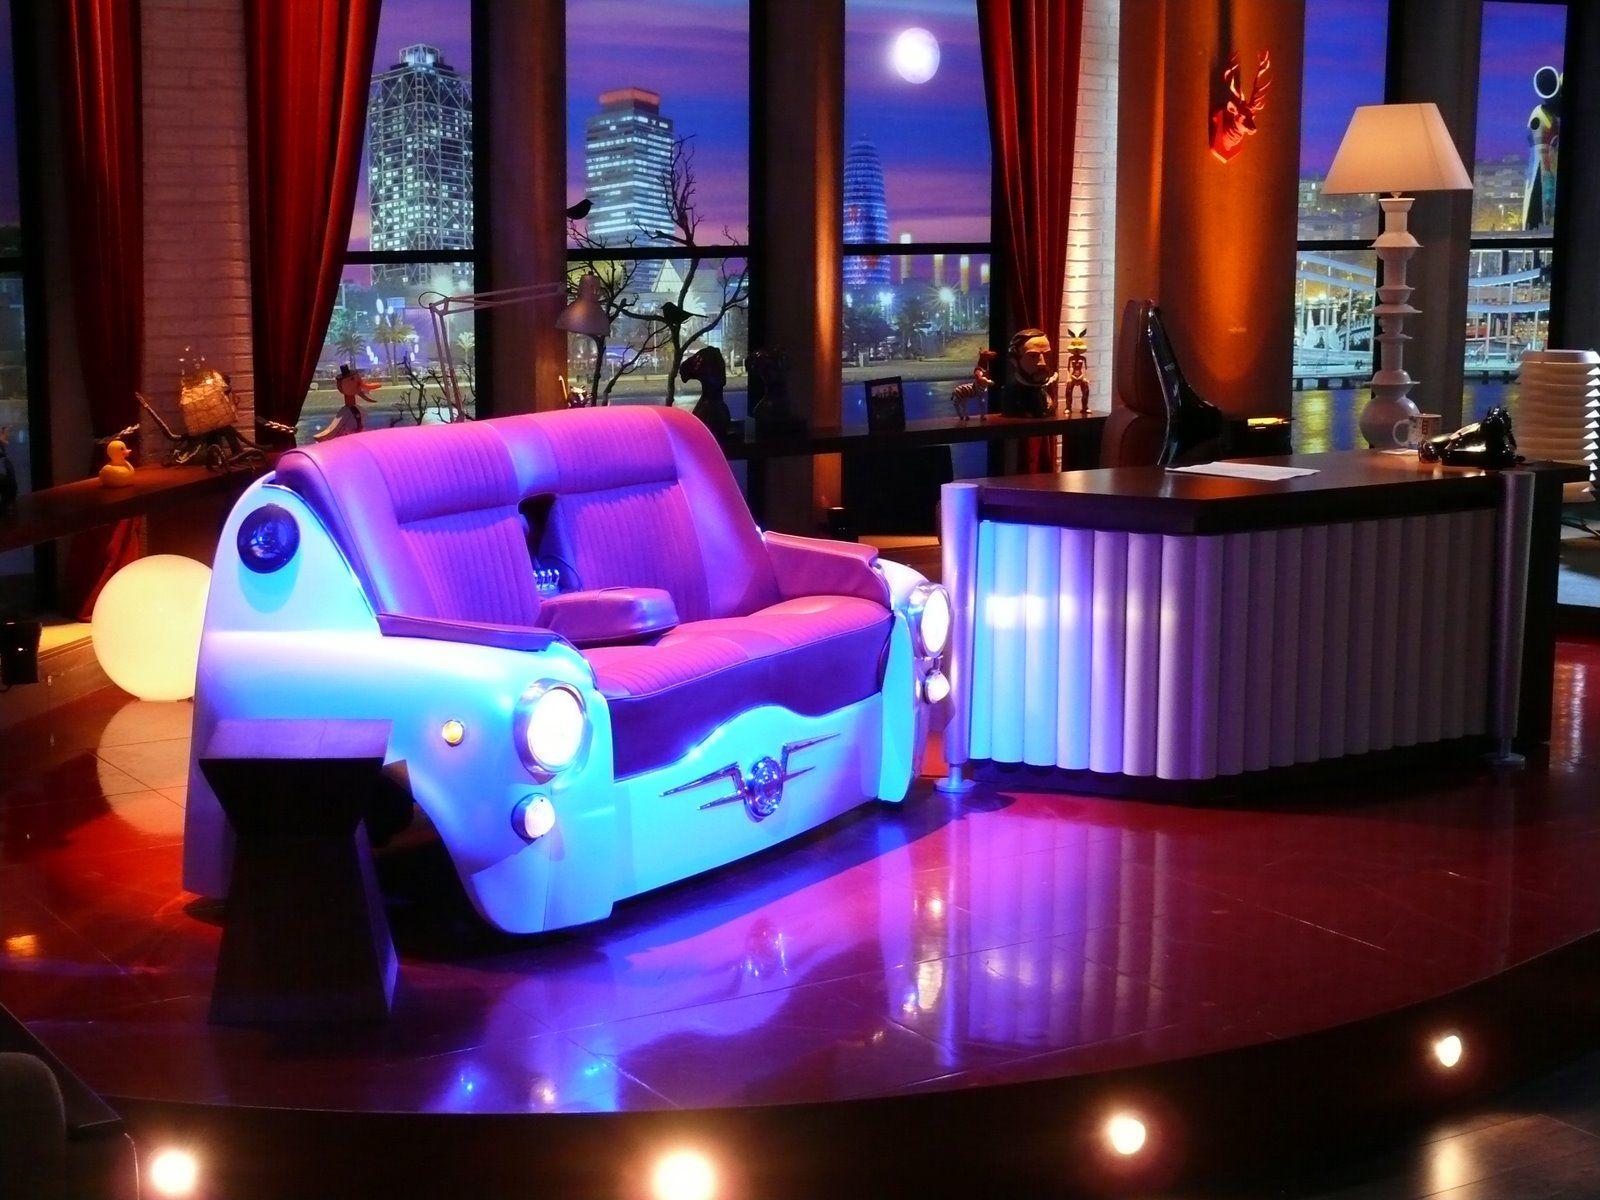 Buenafuente sofa+vespa chair